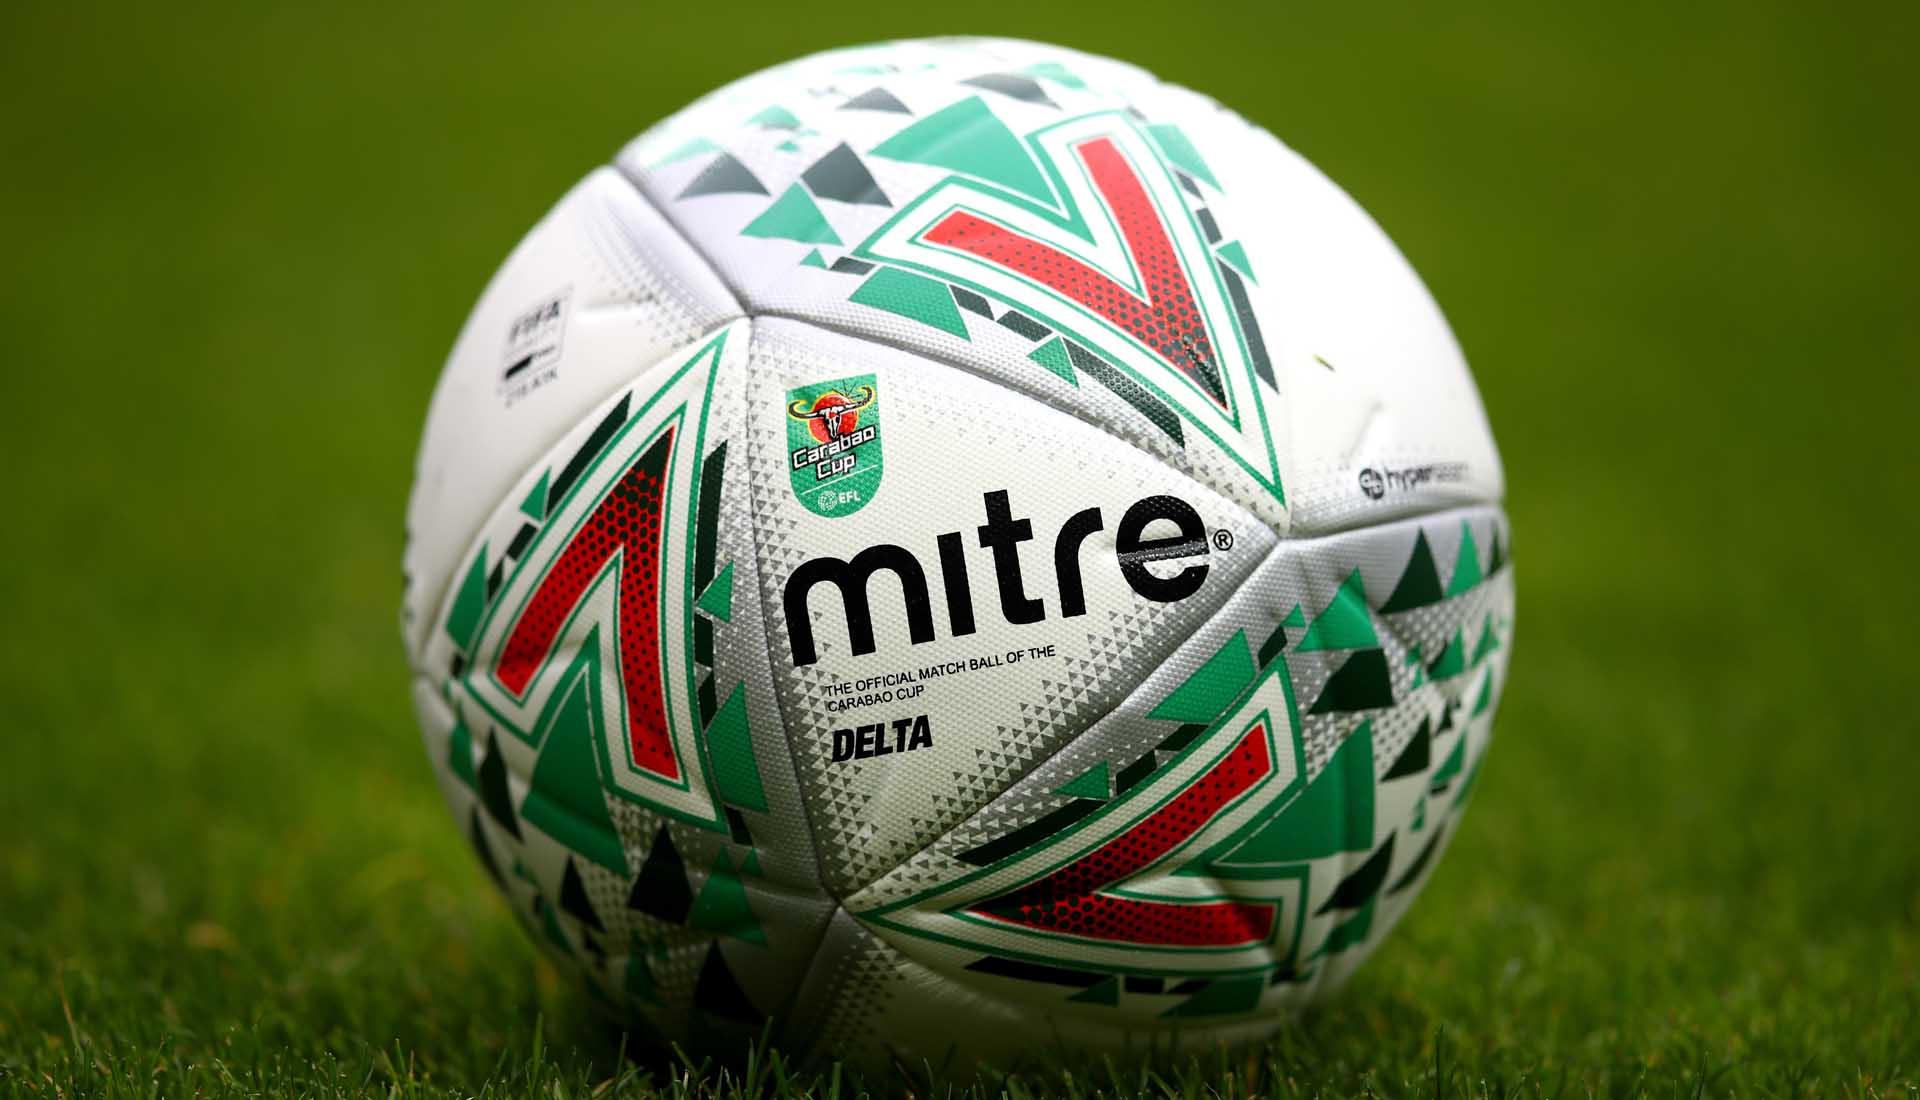 0e296b4f76 Pep Guardiola Slams Carabao Cup Match Ball - SoccerBible.